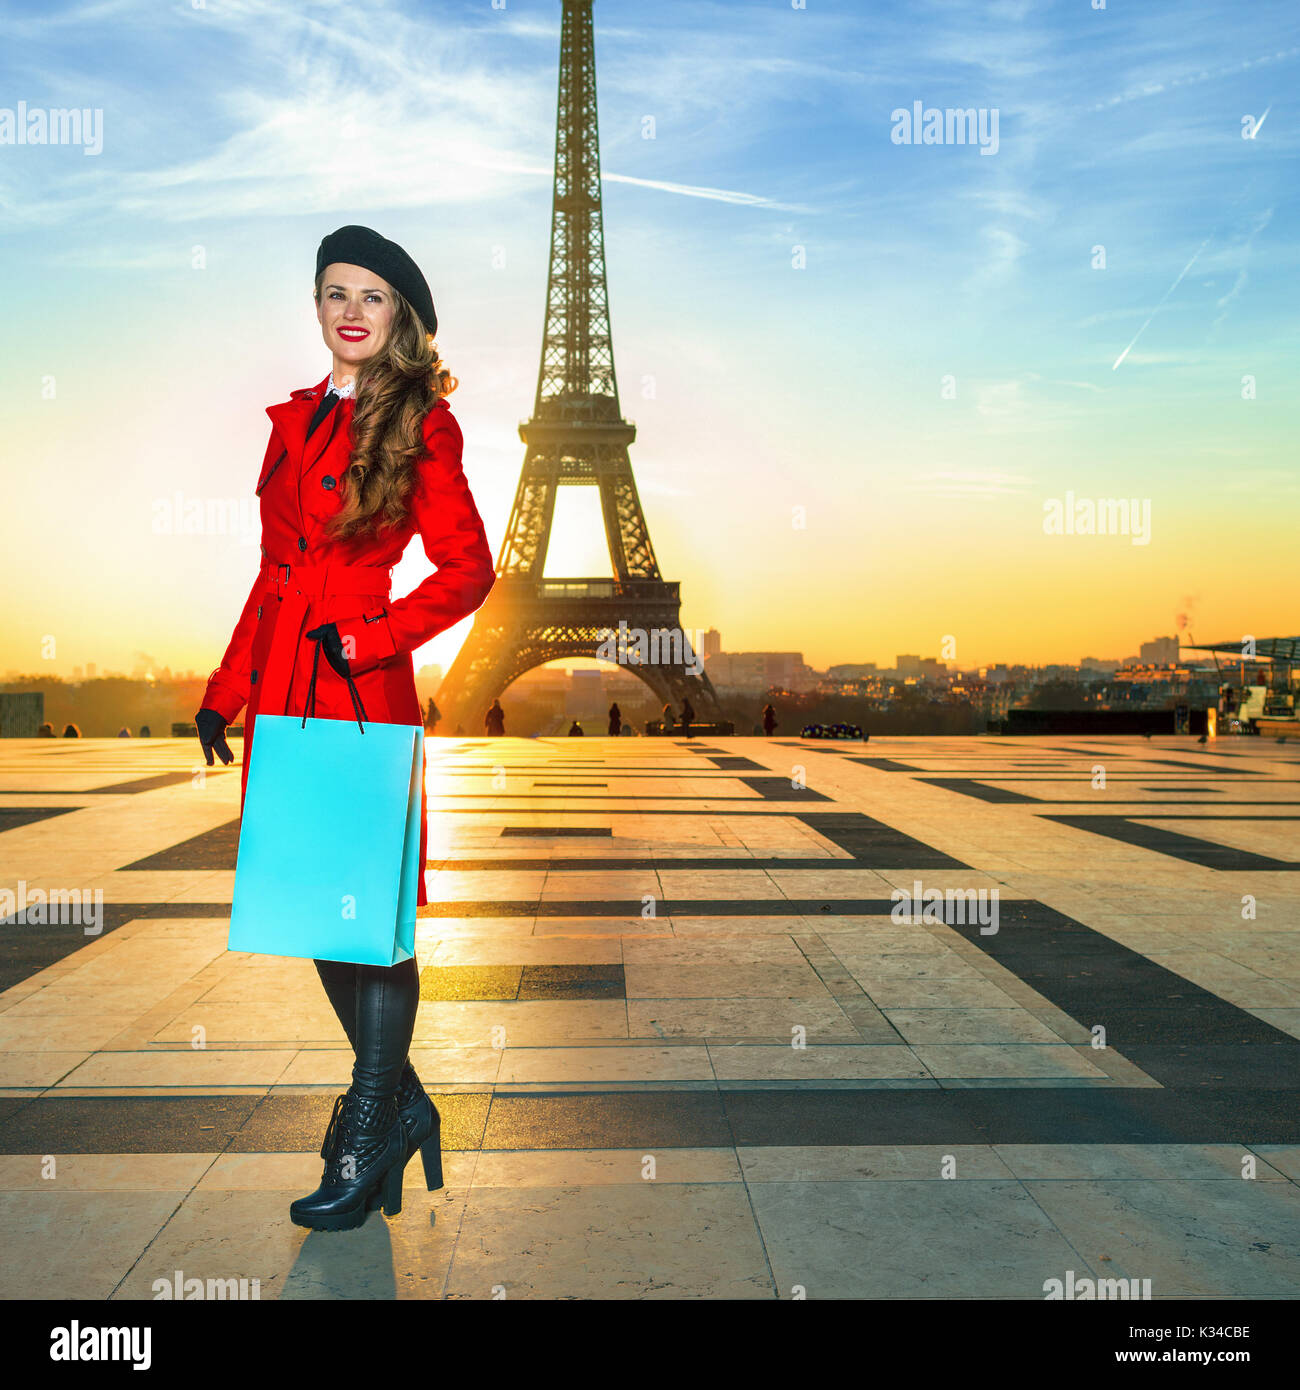 Paris France Luxury Shopping Fashion Stock Photos & Paris ...